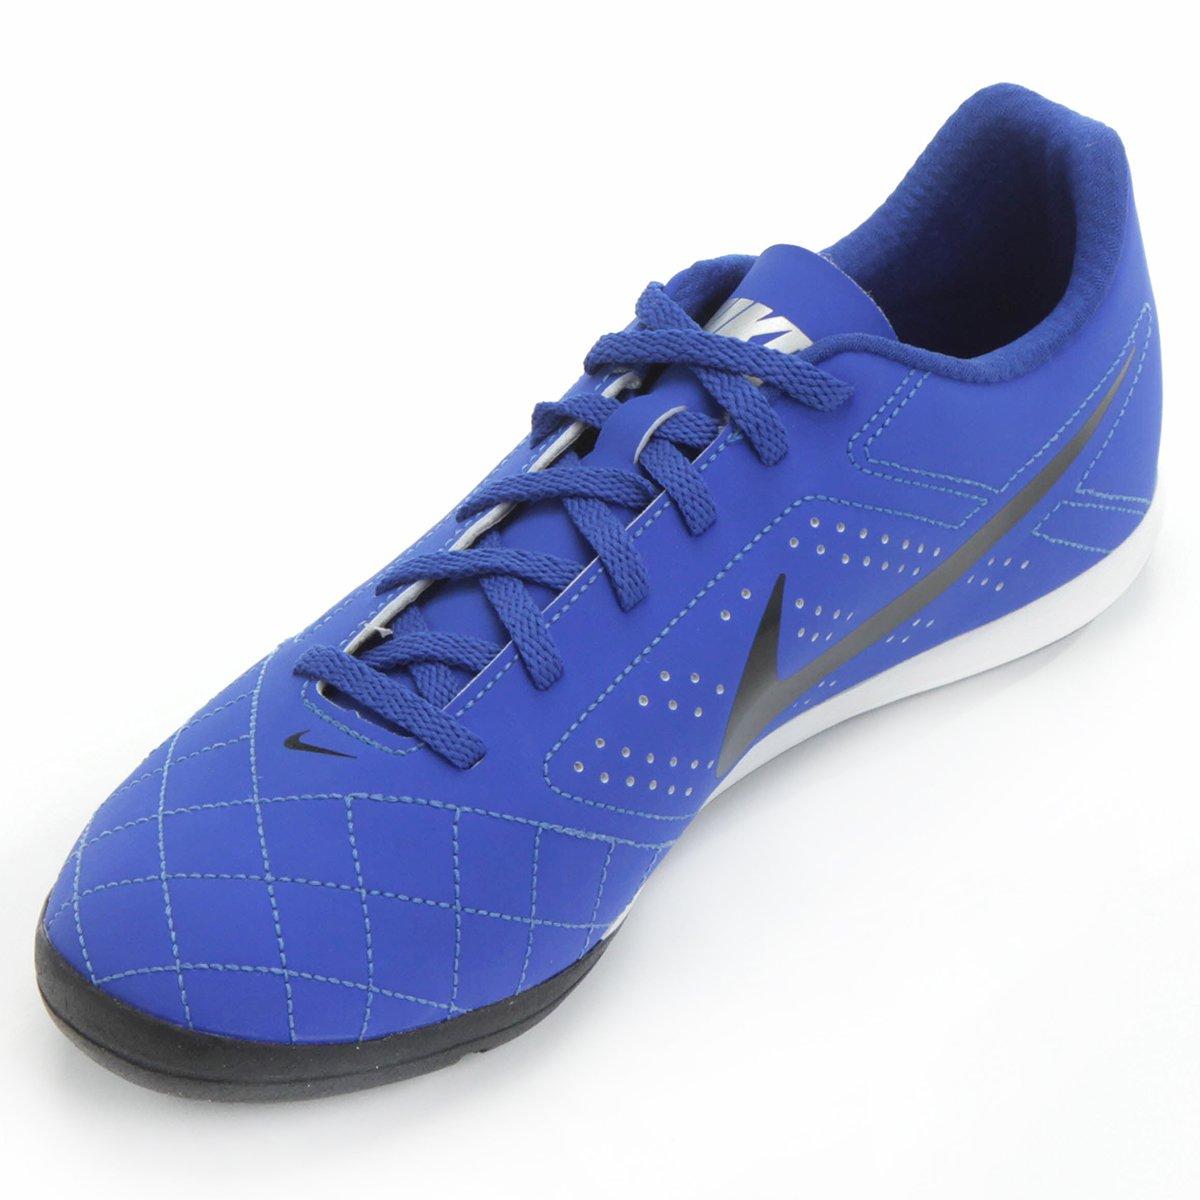 2dba1ad97f Chuteira Futsal Nike Beco 2 Futsal - Azul Royal - Compre Agora ...